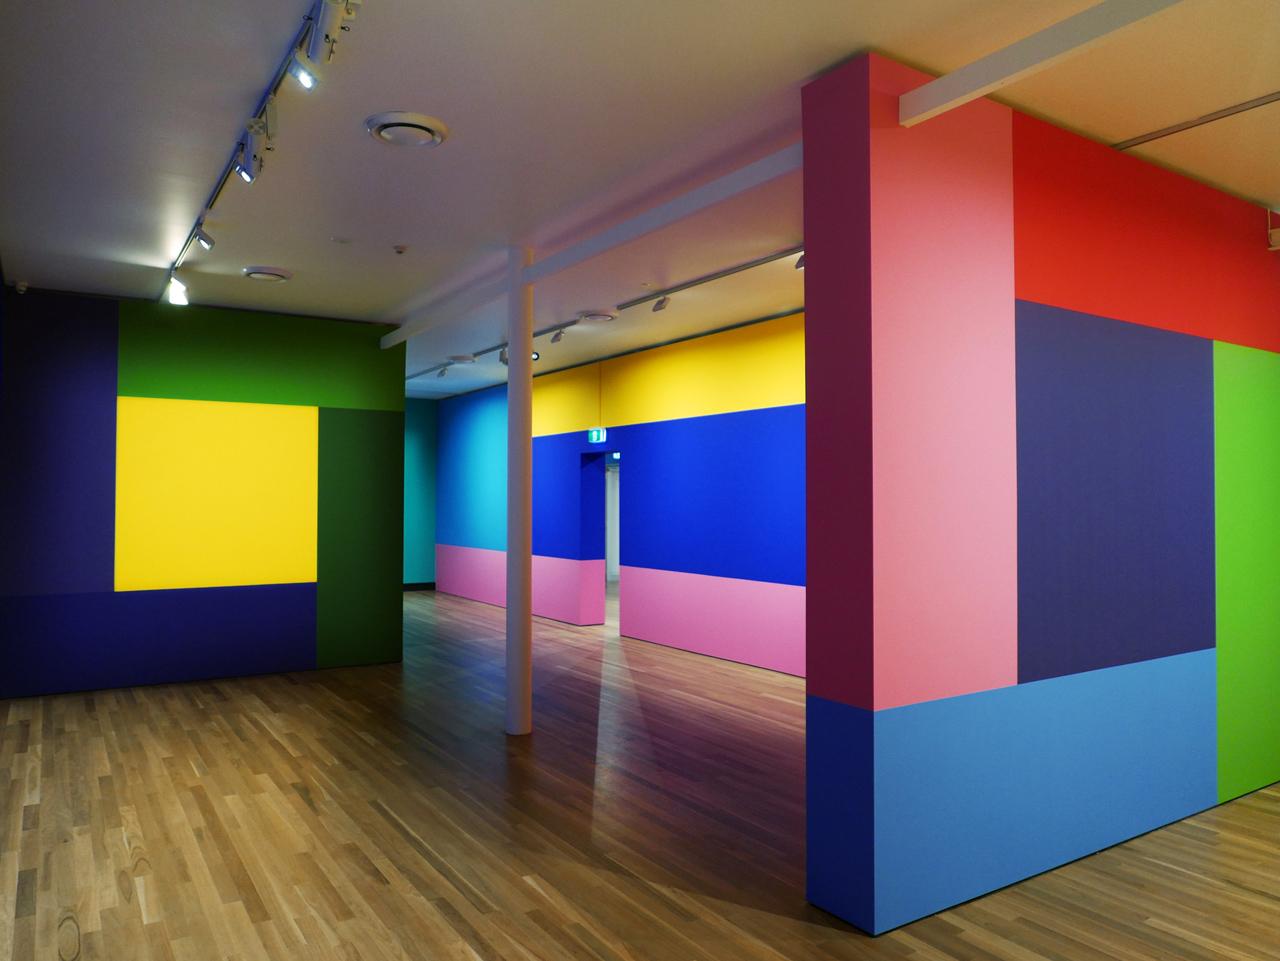 Robert Owen Afterglow Latrobe Reginal Gallery Install 12_LR.jpg